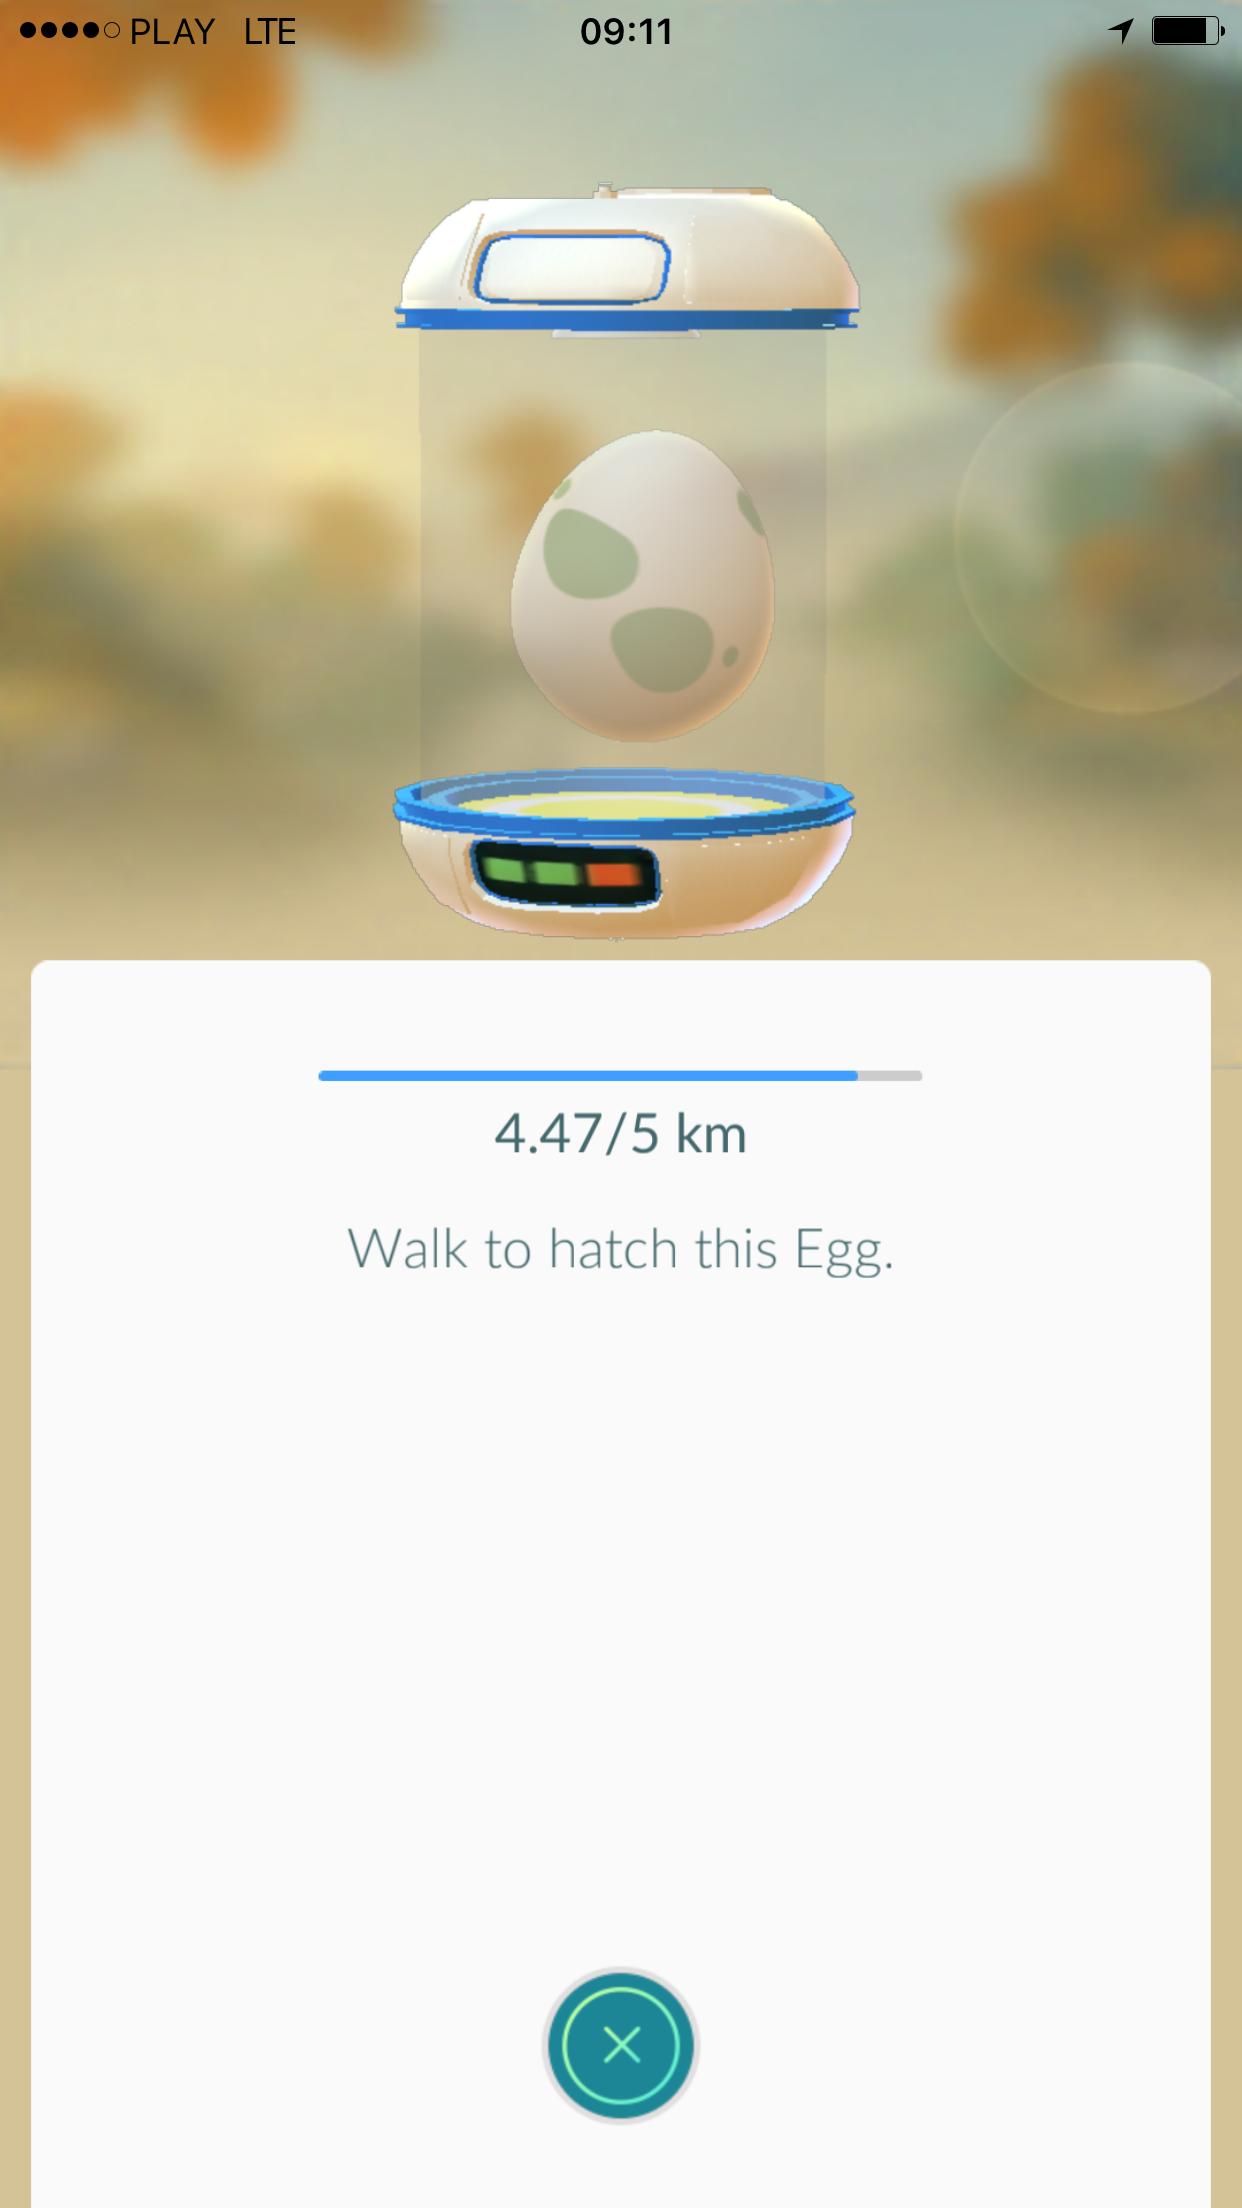 Egg pokemon - Pokemon GO